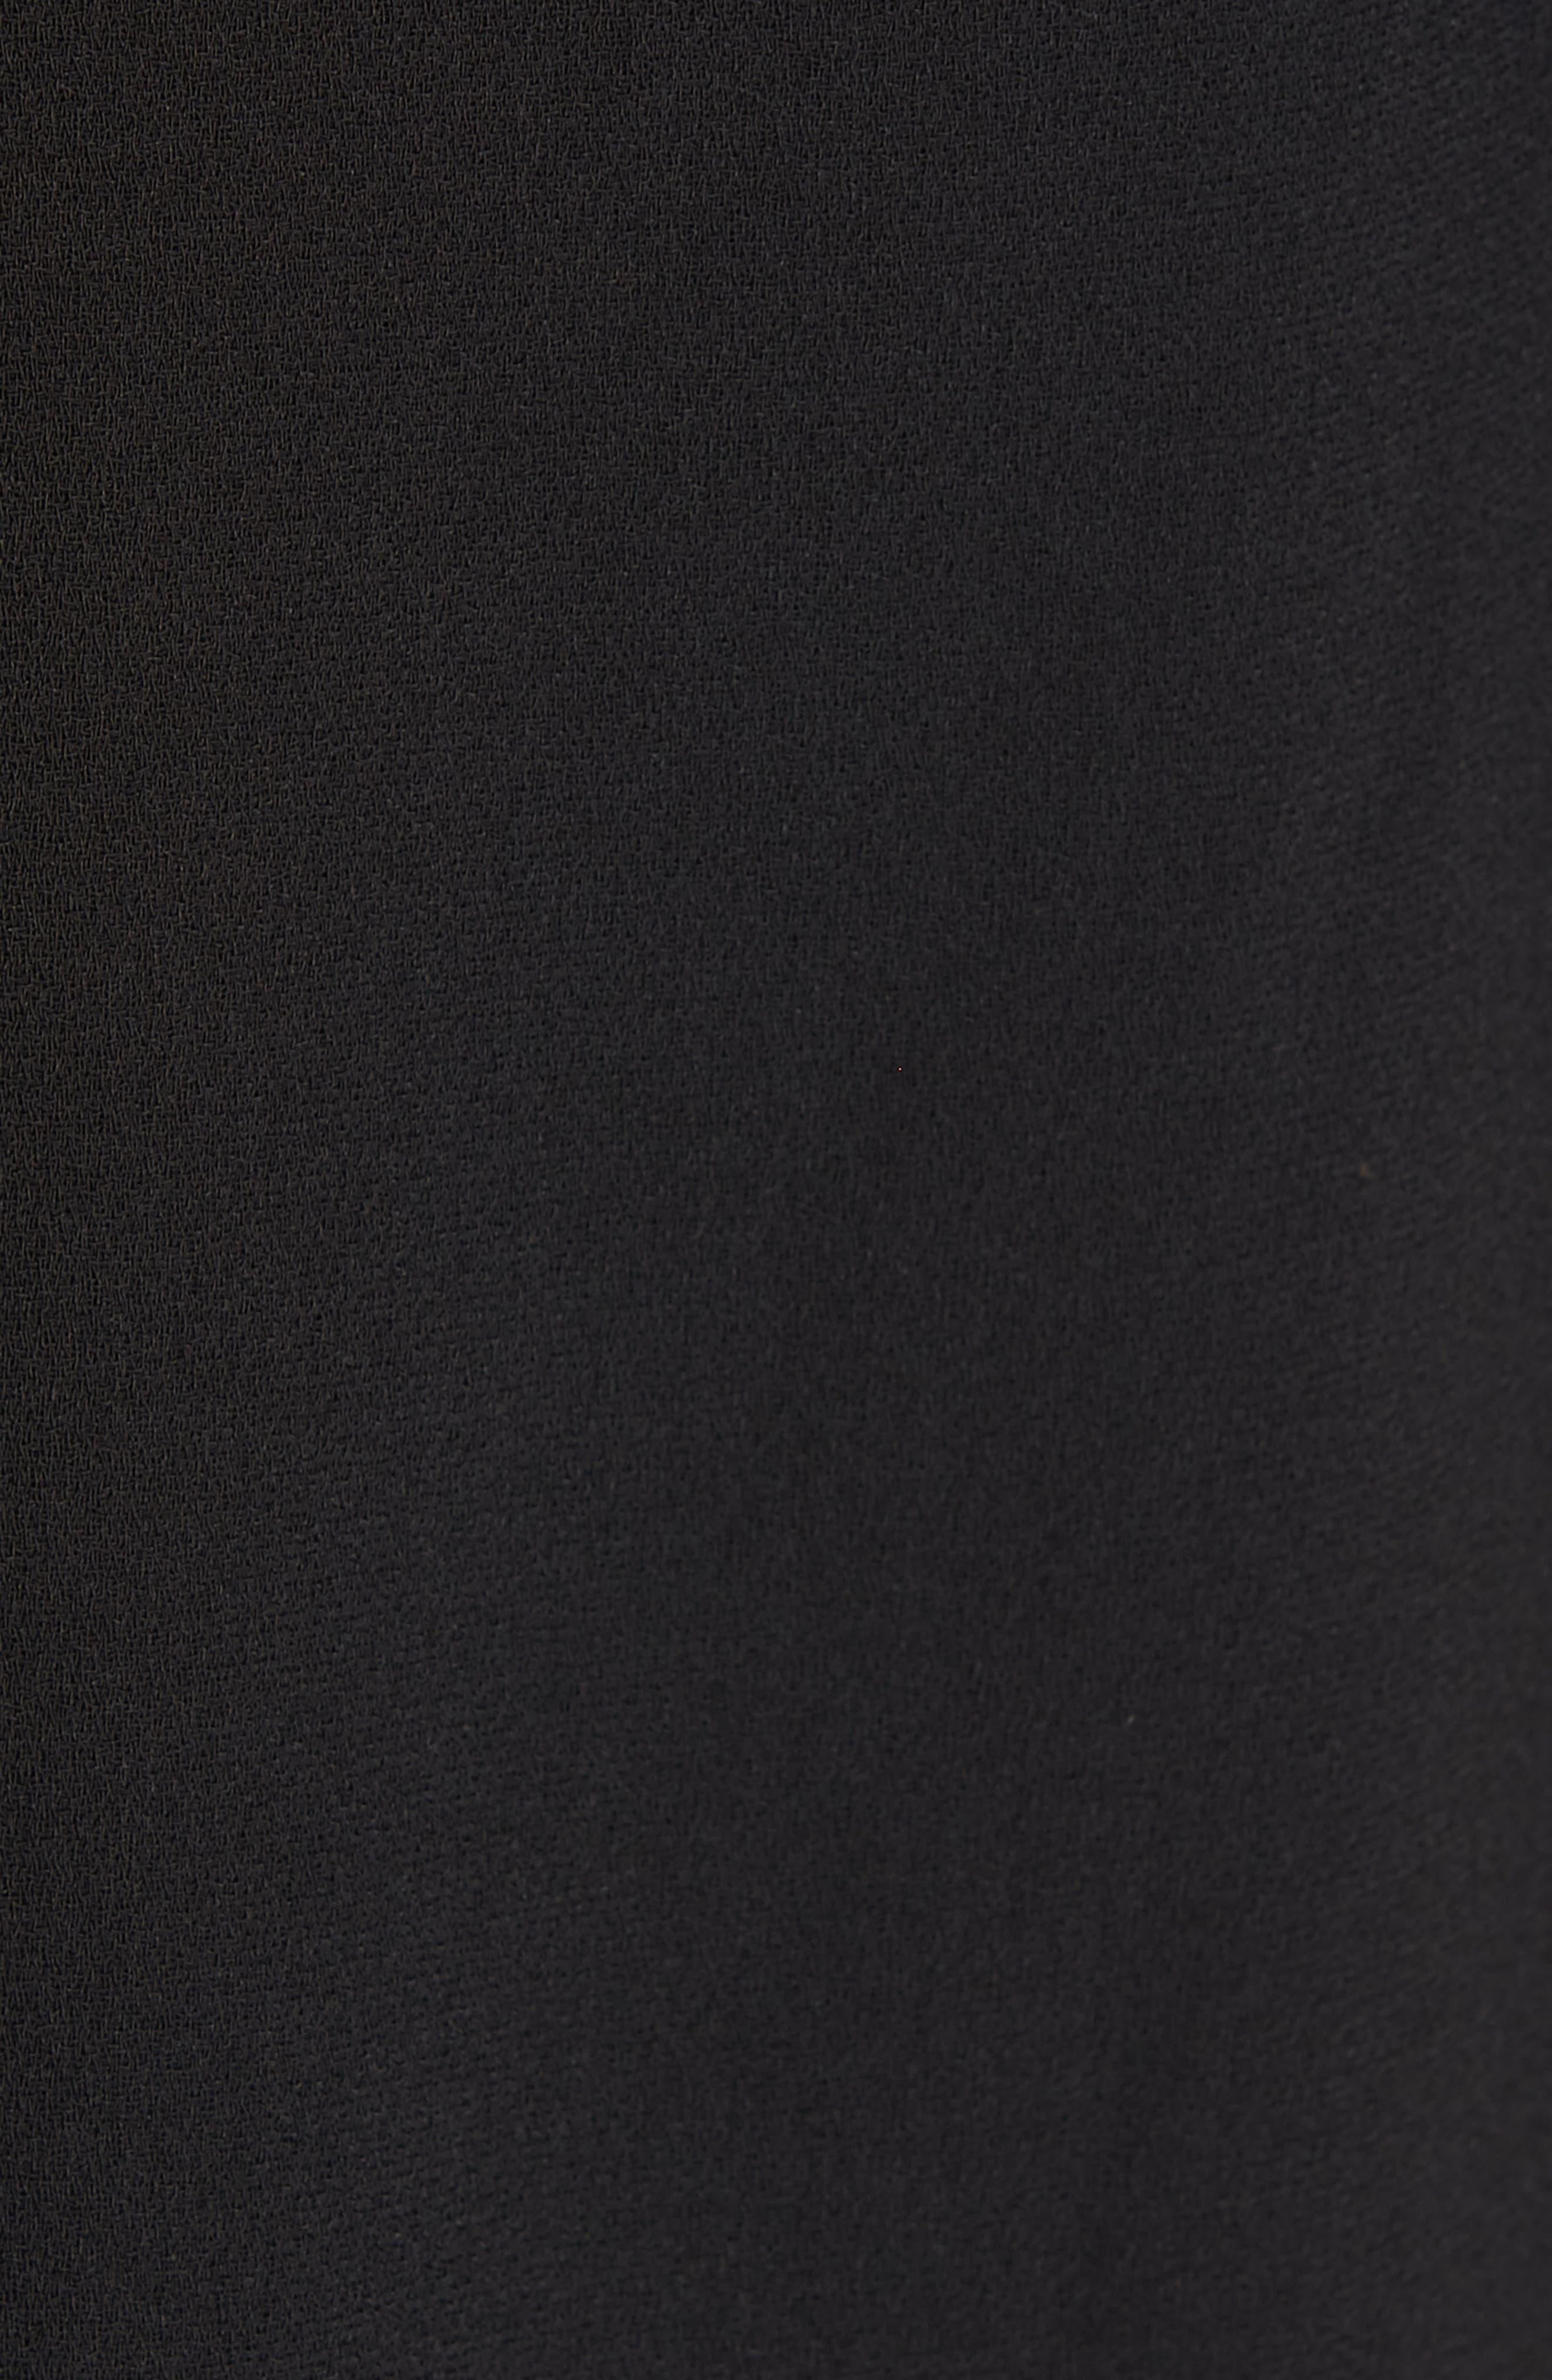 TED BAKER LONDON, Lace Panel Bell Sleeve Tunic Dress, Alternate thumbnail 6, color, BLACK